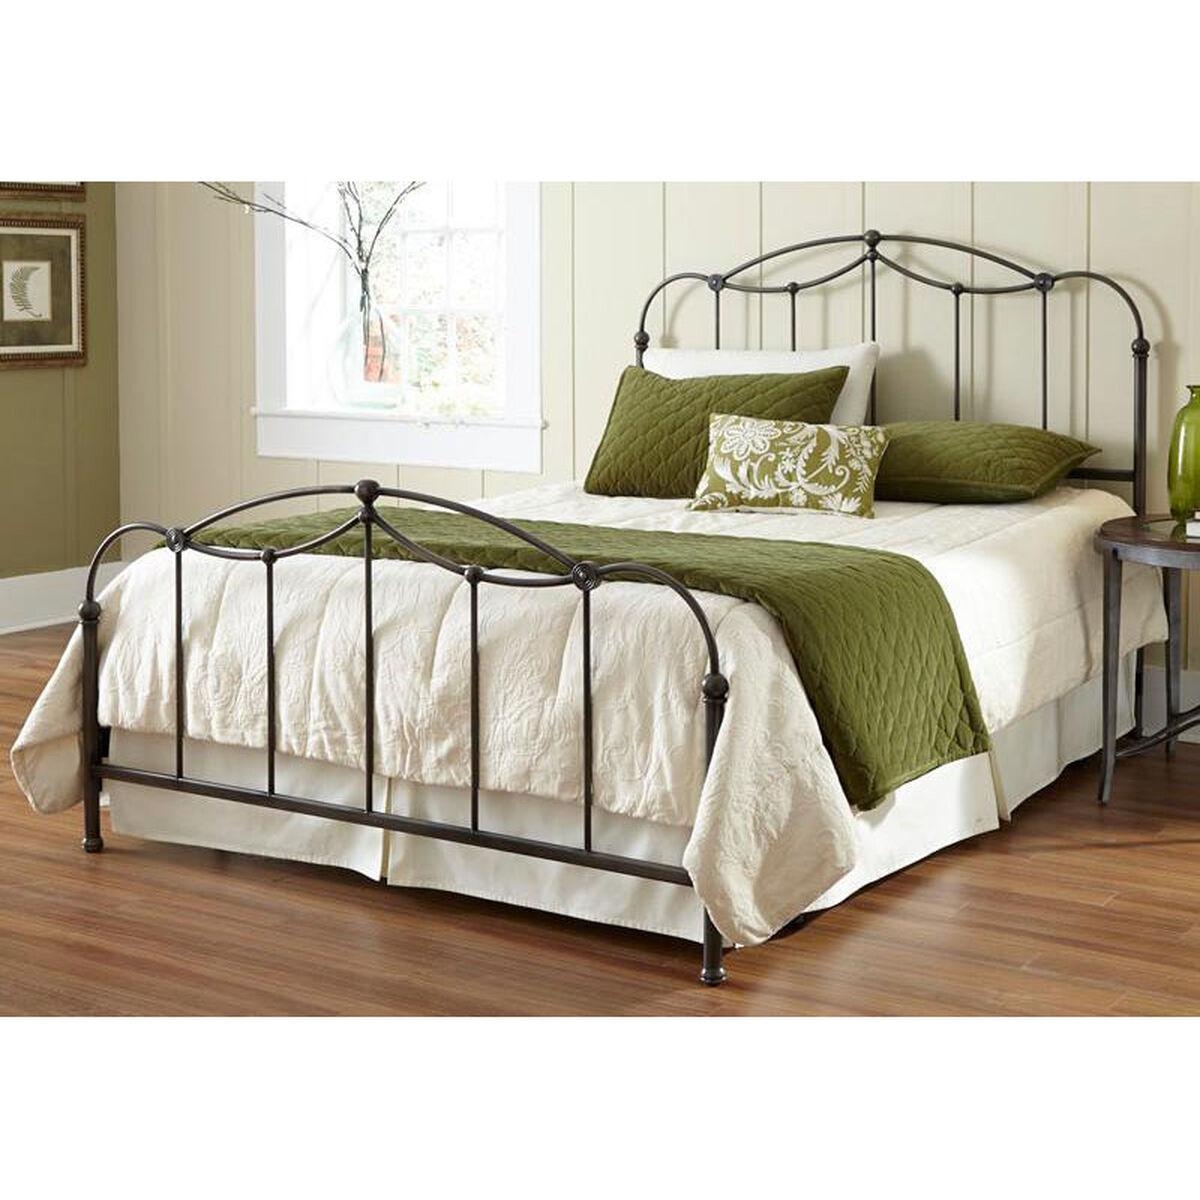 Metal Bed Frame Queen B11275 Bizchair Com